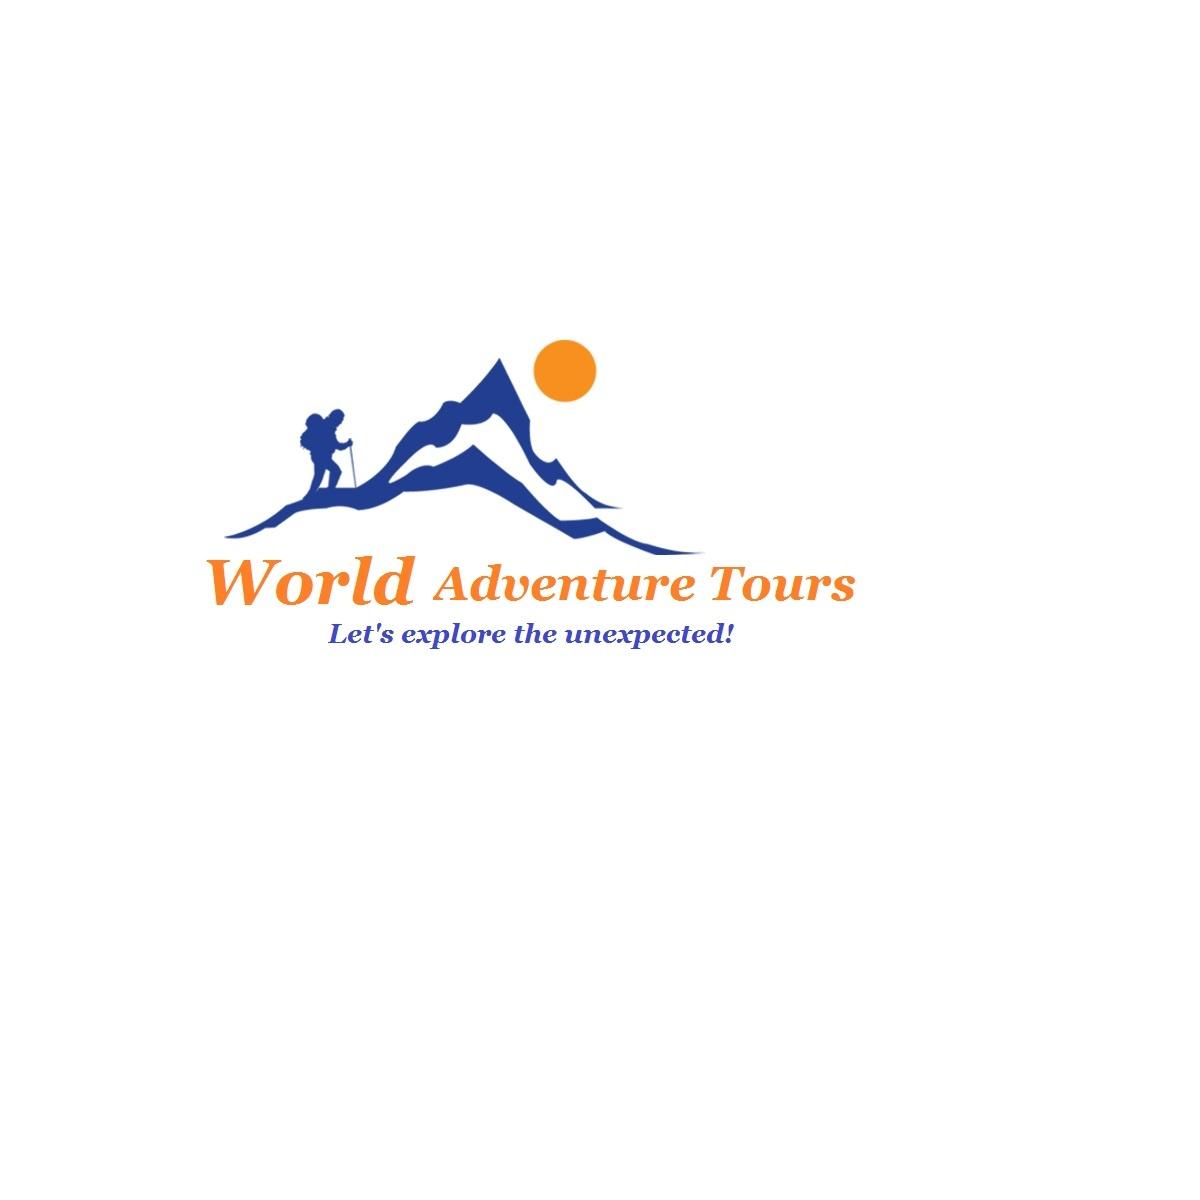 World Adventure Tours